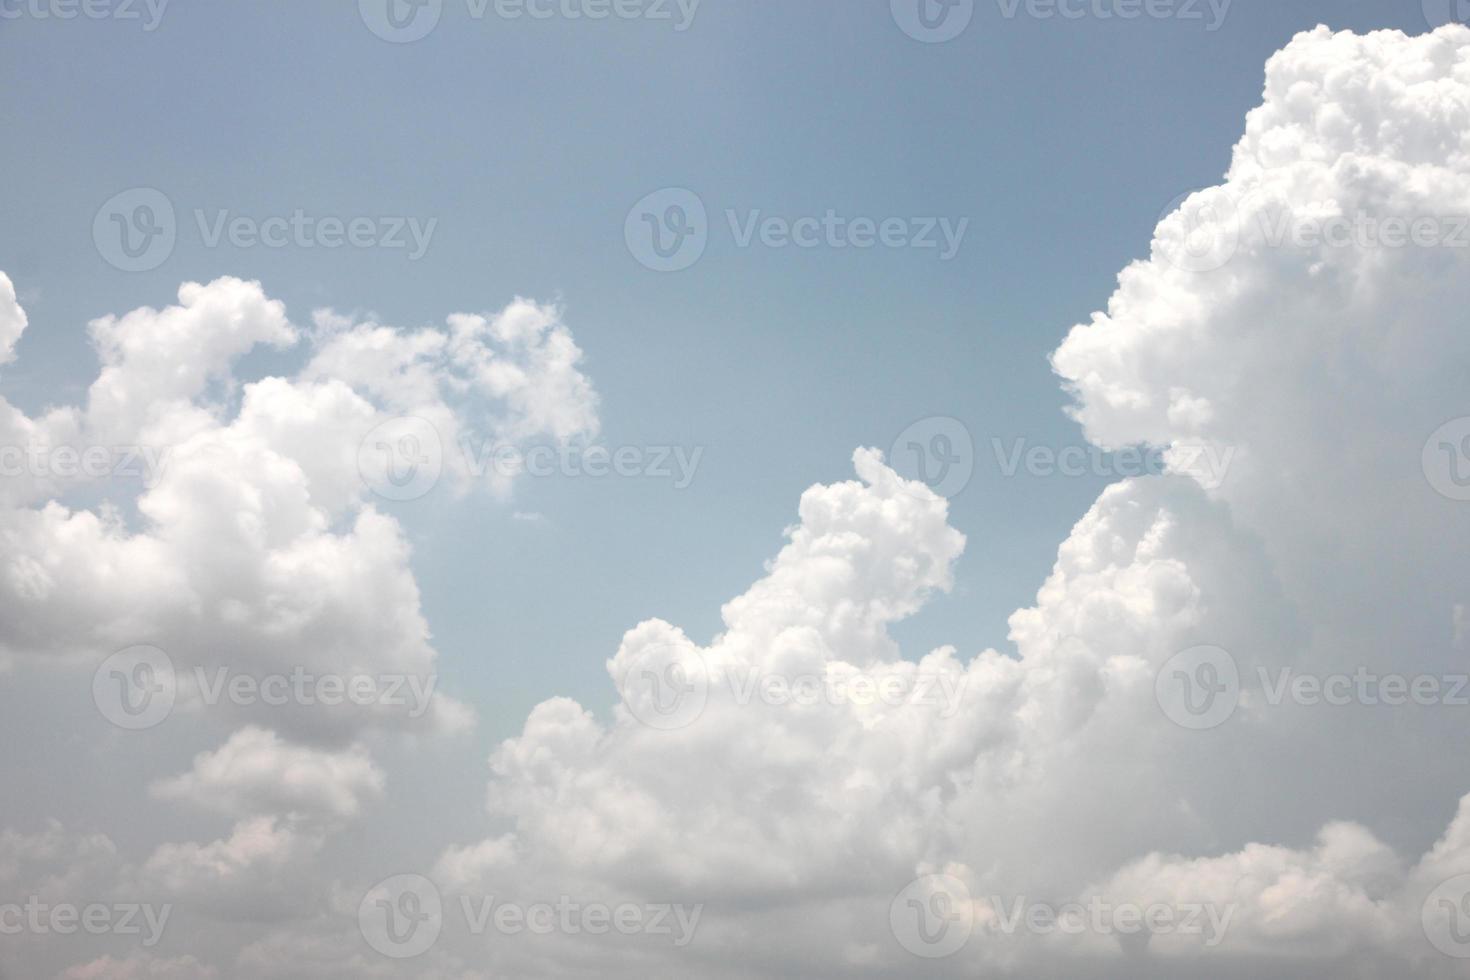 nuvole bianche su un cielo blu. foto